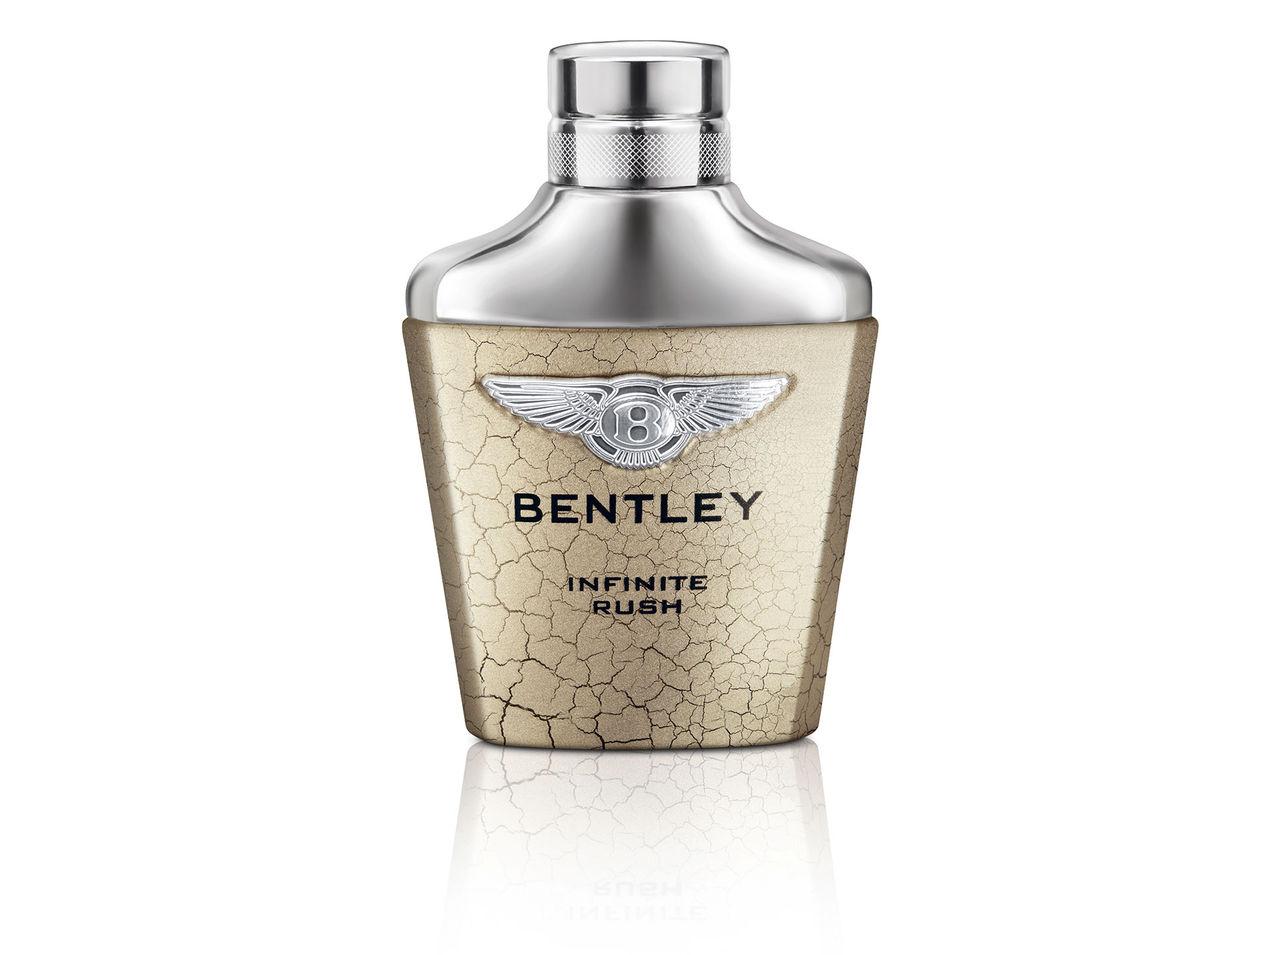 Mer parfym från Bentley